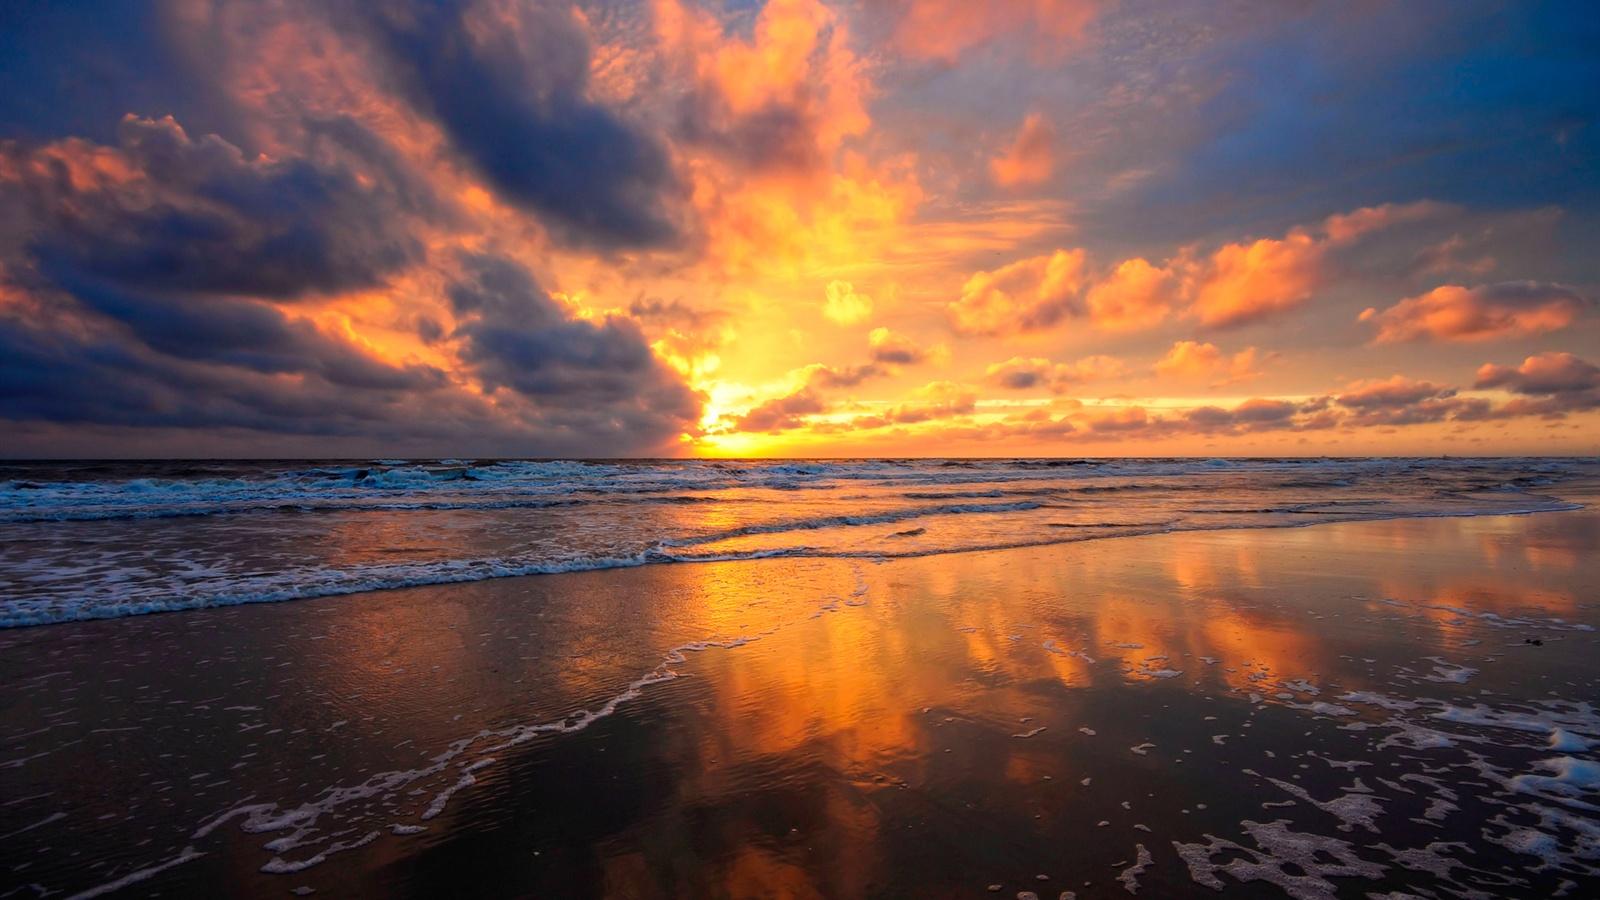 sunset beach nature sea - photo #14